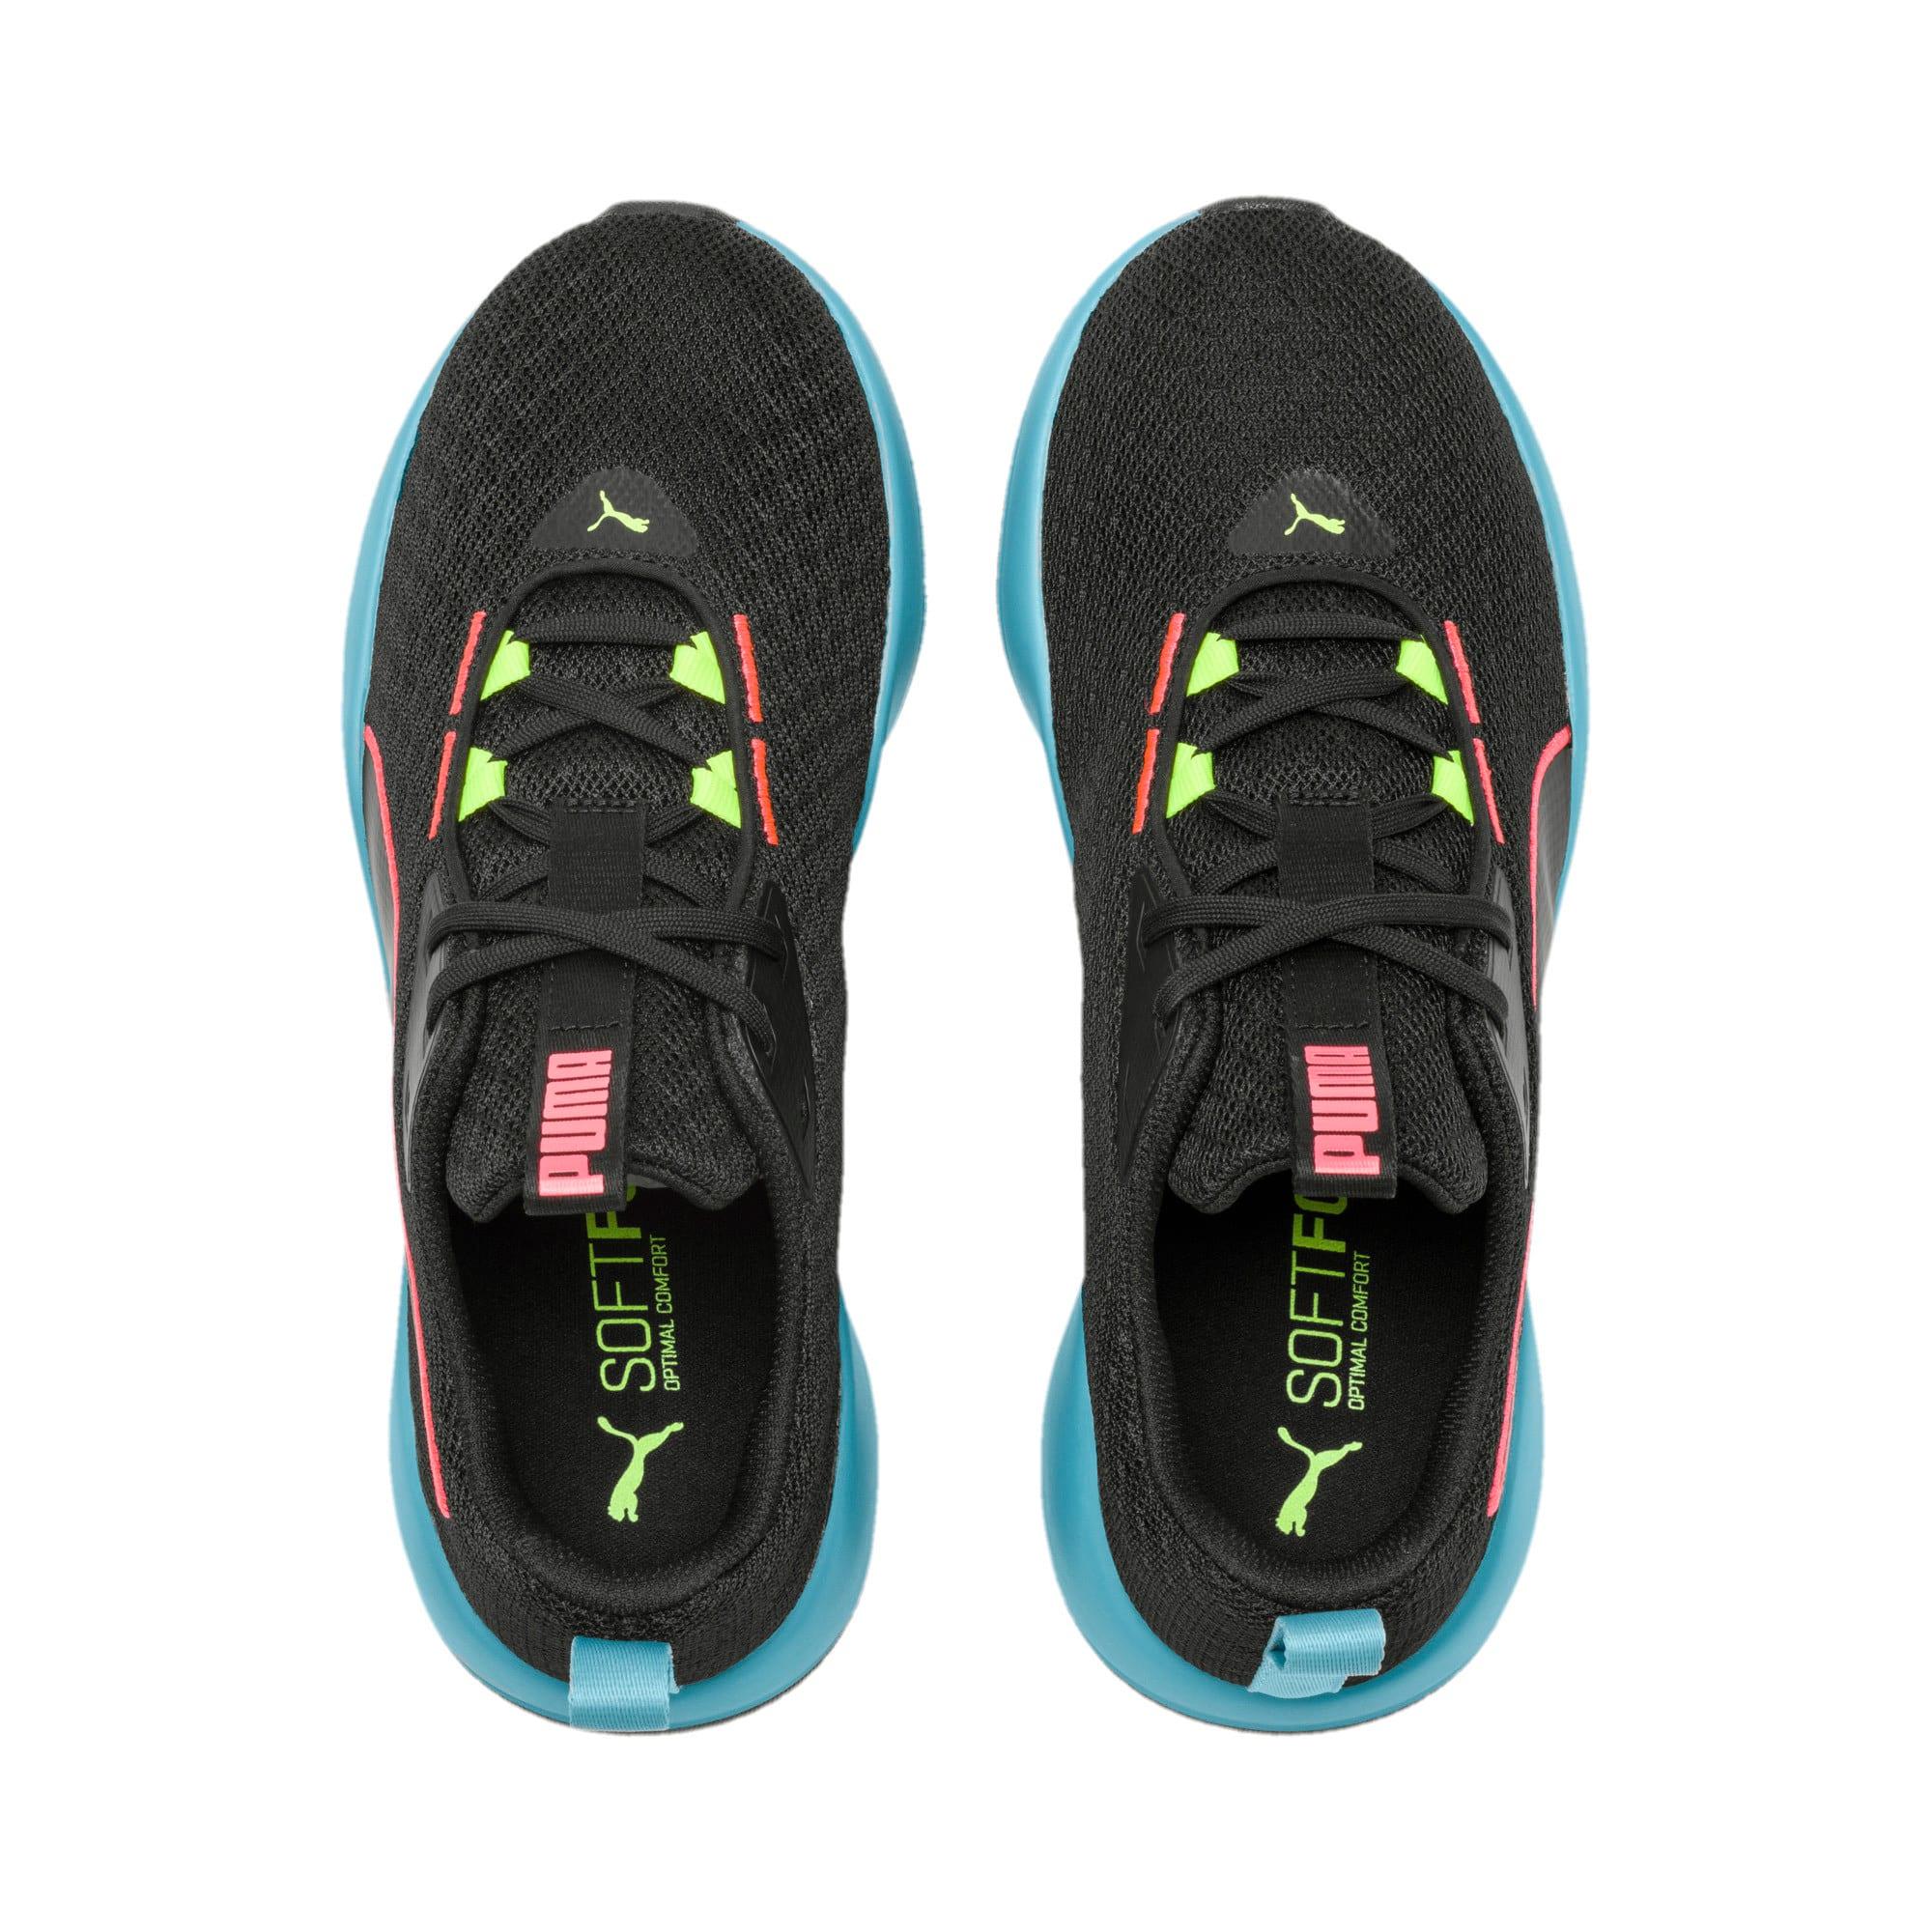 Thumbnail 7 of Flourish FS Women's Training Shoes, Puma Black-Milky Blue, medium